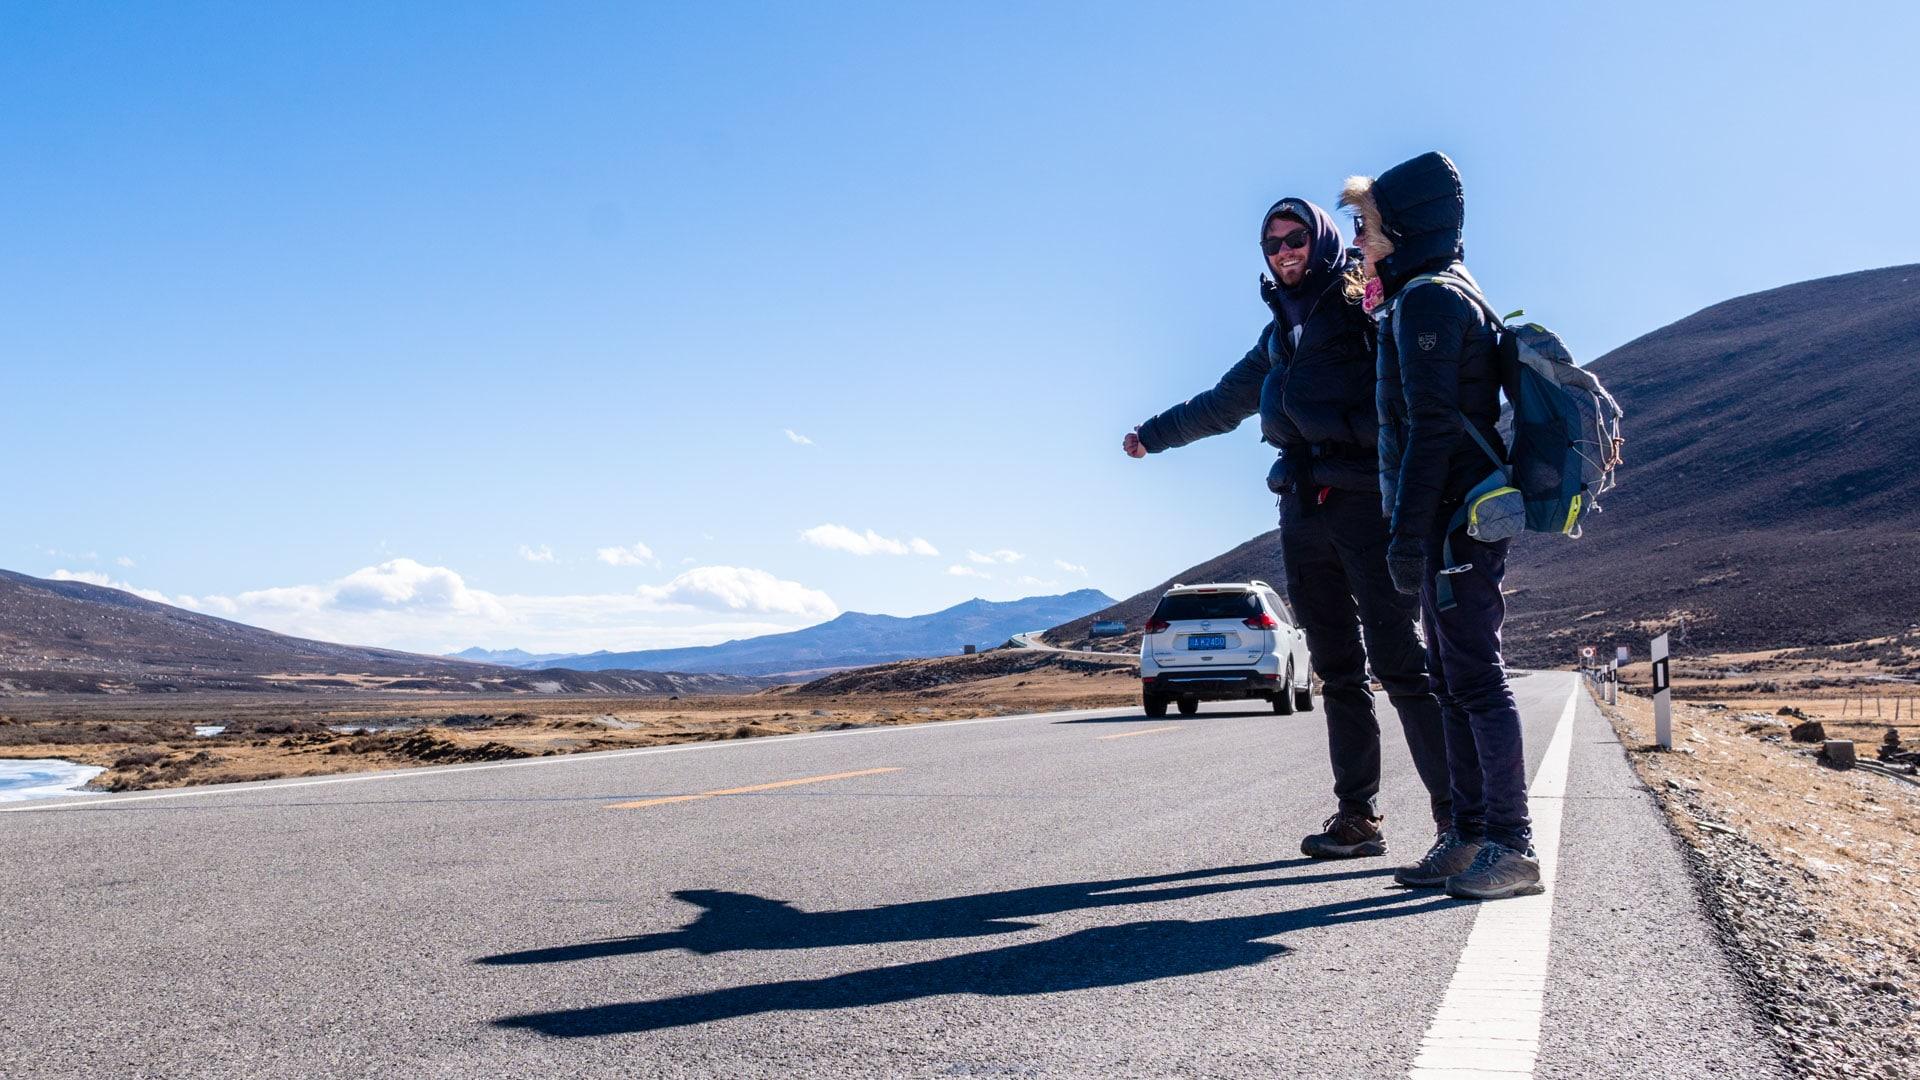 SerialHikers stop autostop world monde tour hitchhiking aventure adventure alternative travel voyage sans avion no fly china chine tibet litang carbon footprint